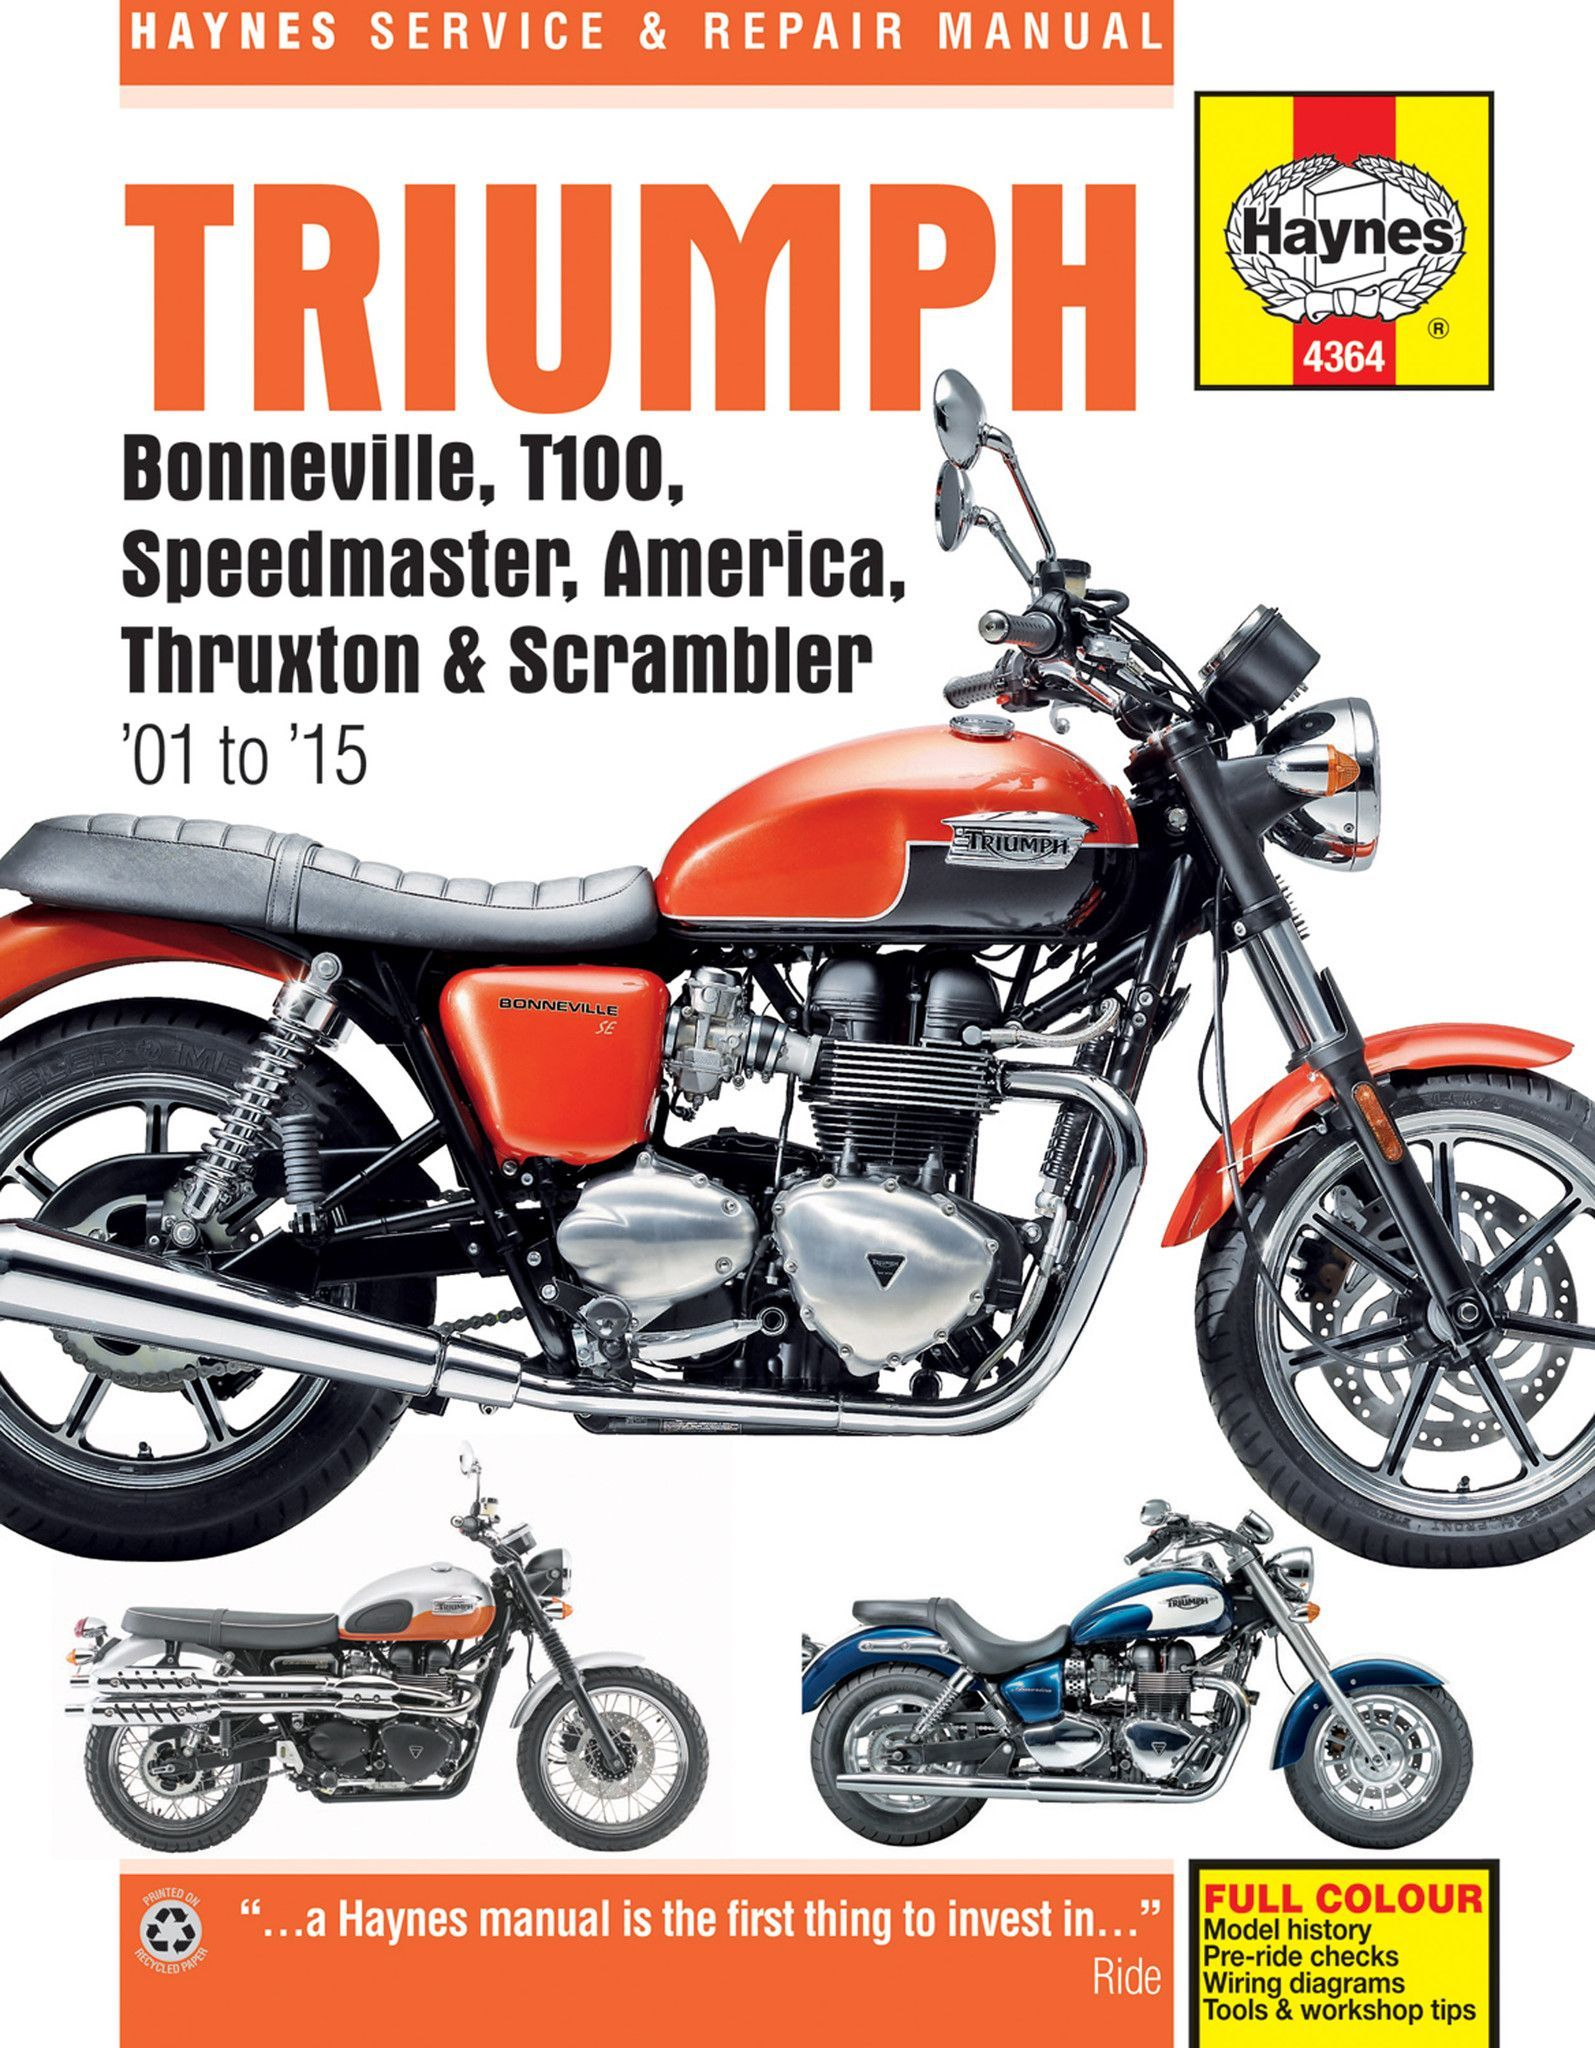 Haynes M4364 Repair Manual for Triumph Bonneville, T100, Speedmaster, America, Thruxton and Scrambler